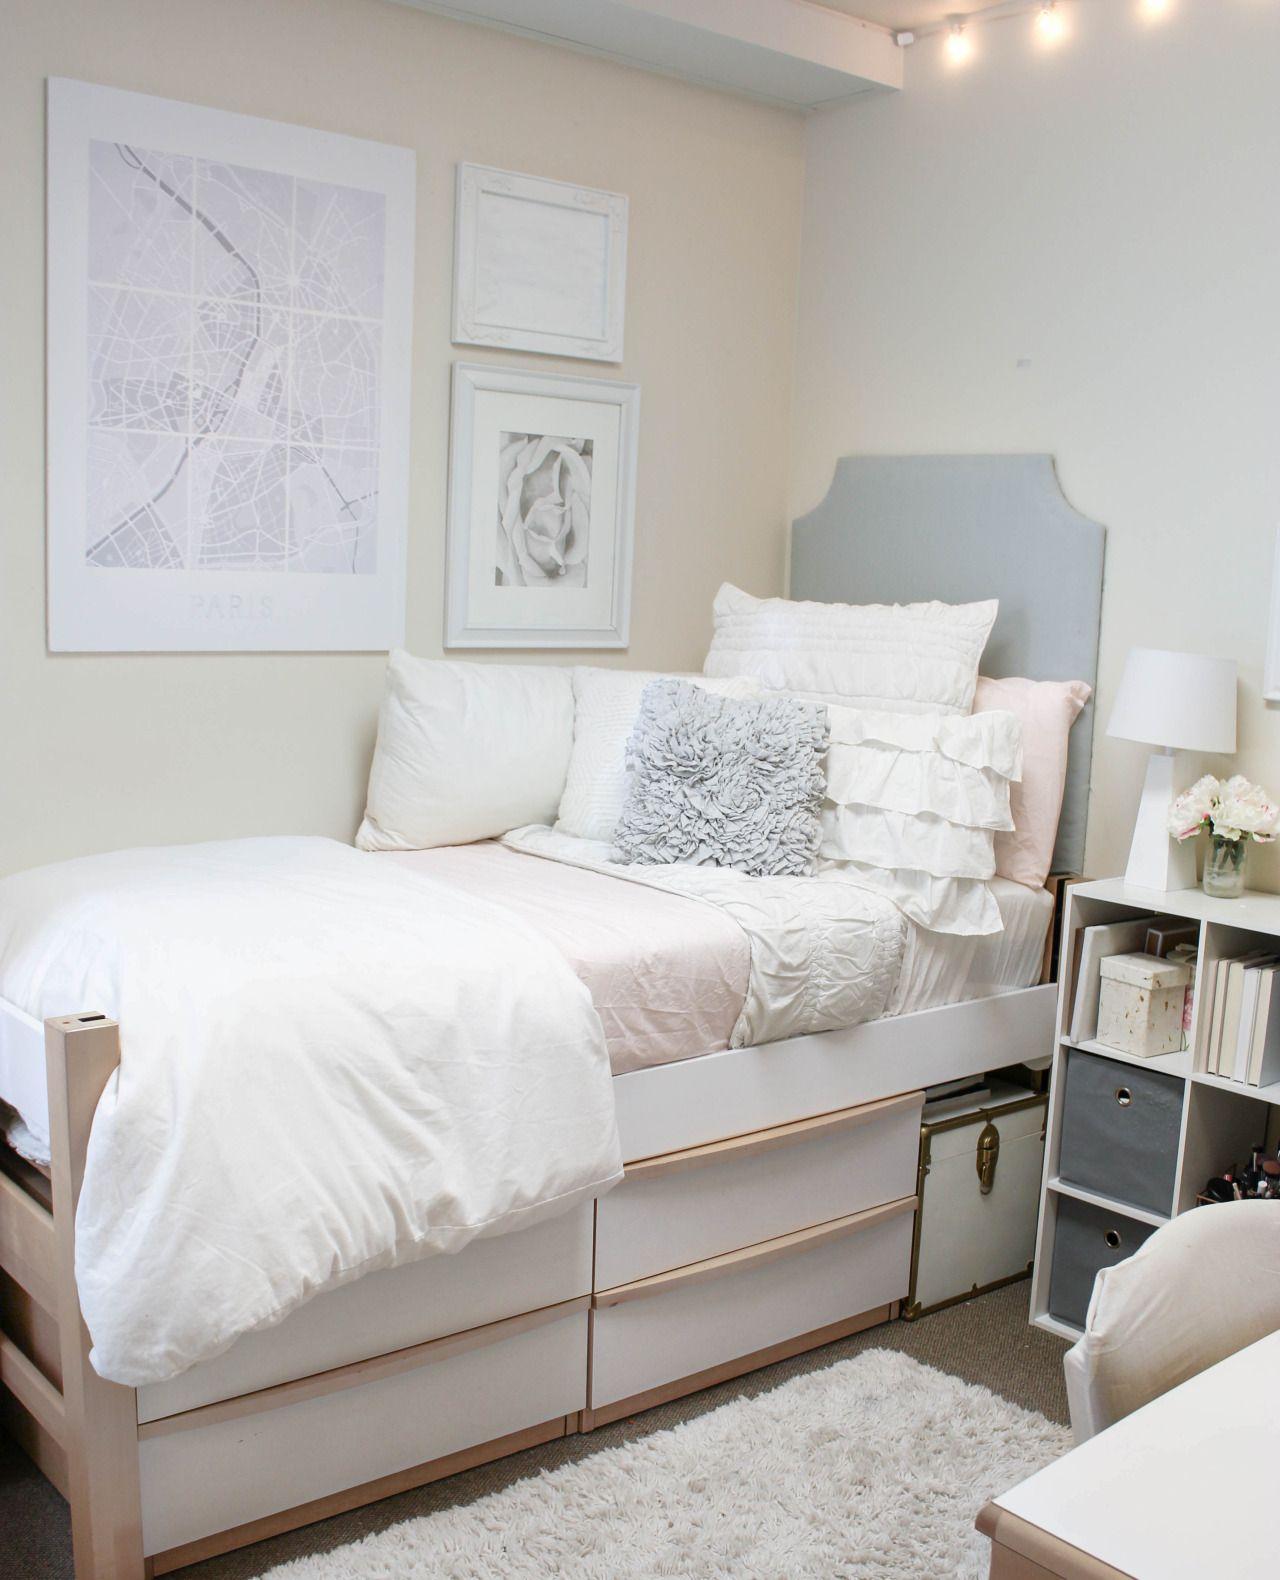 Dorm room essentials san luis obispo dorm room and dorm